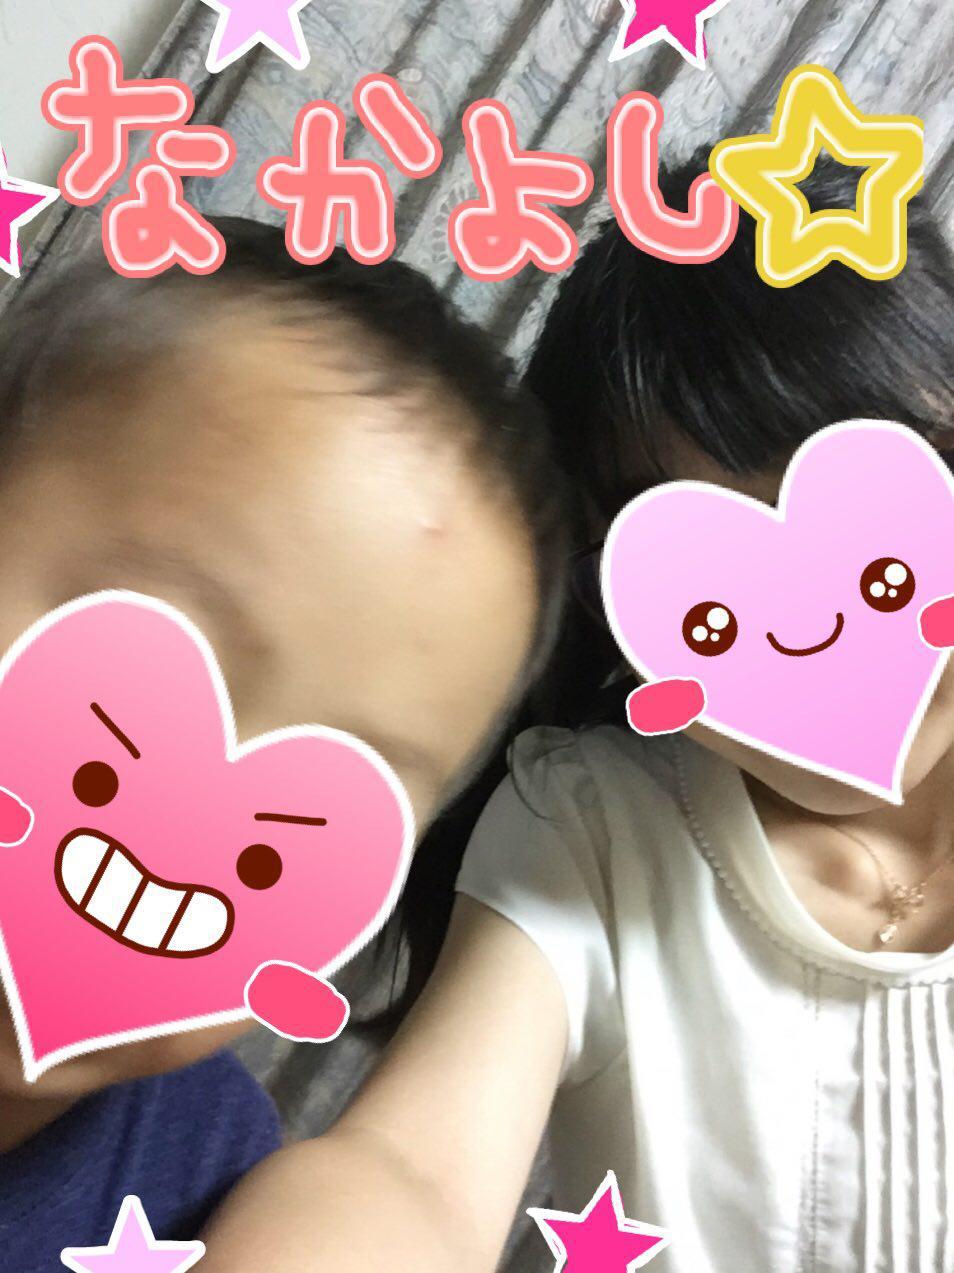 photo_2017-07-02_22-45-09.jpg